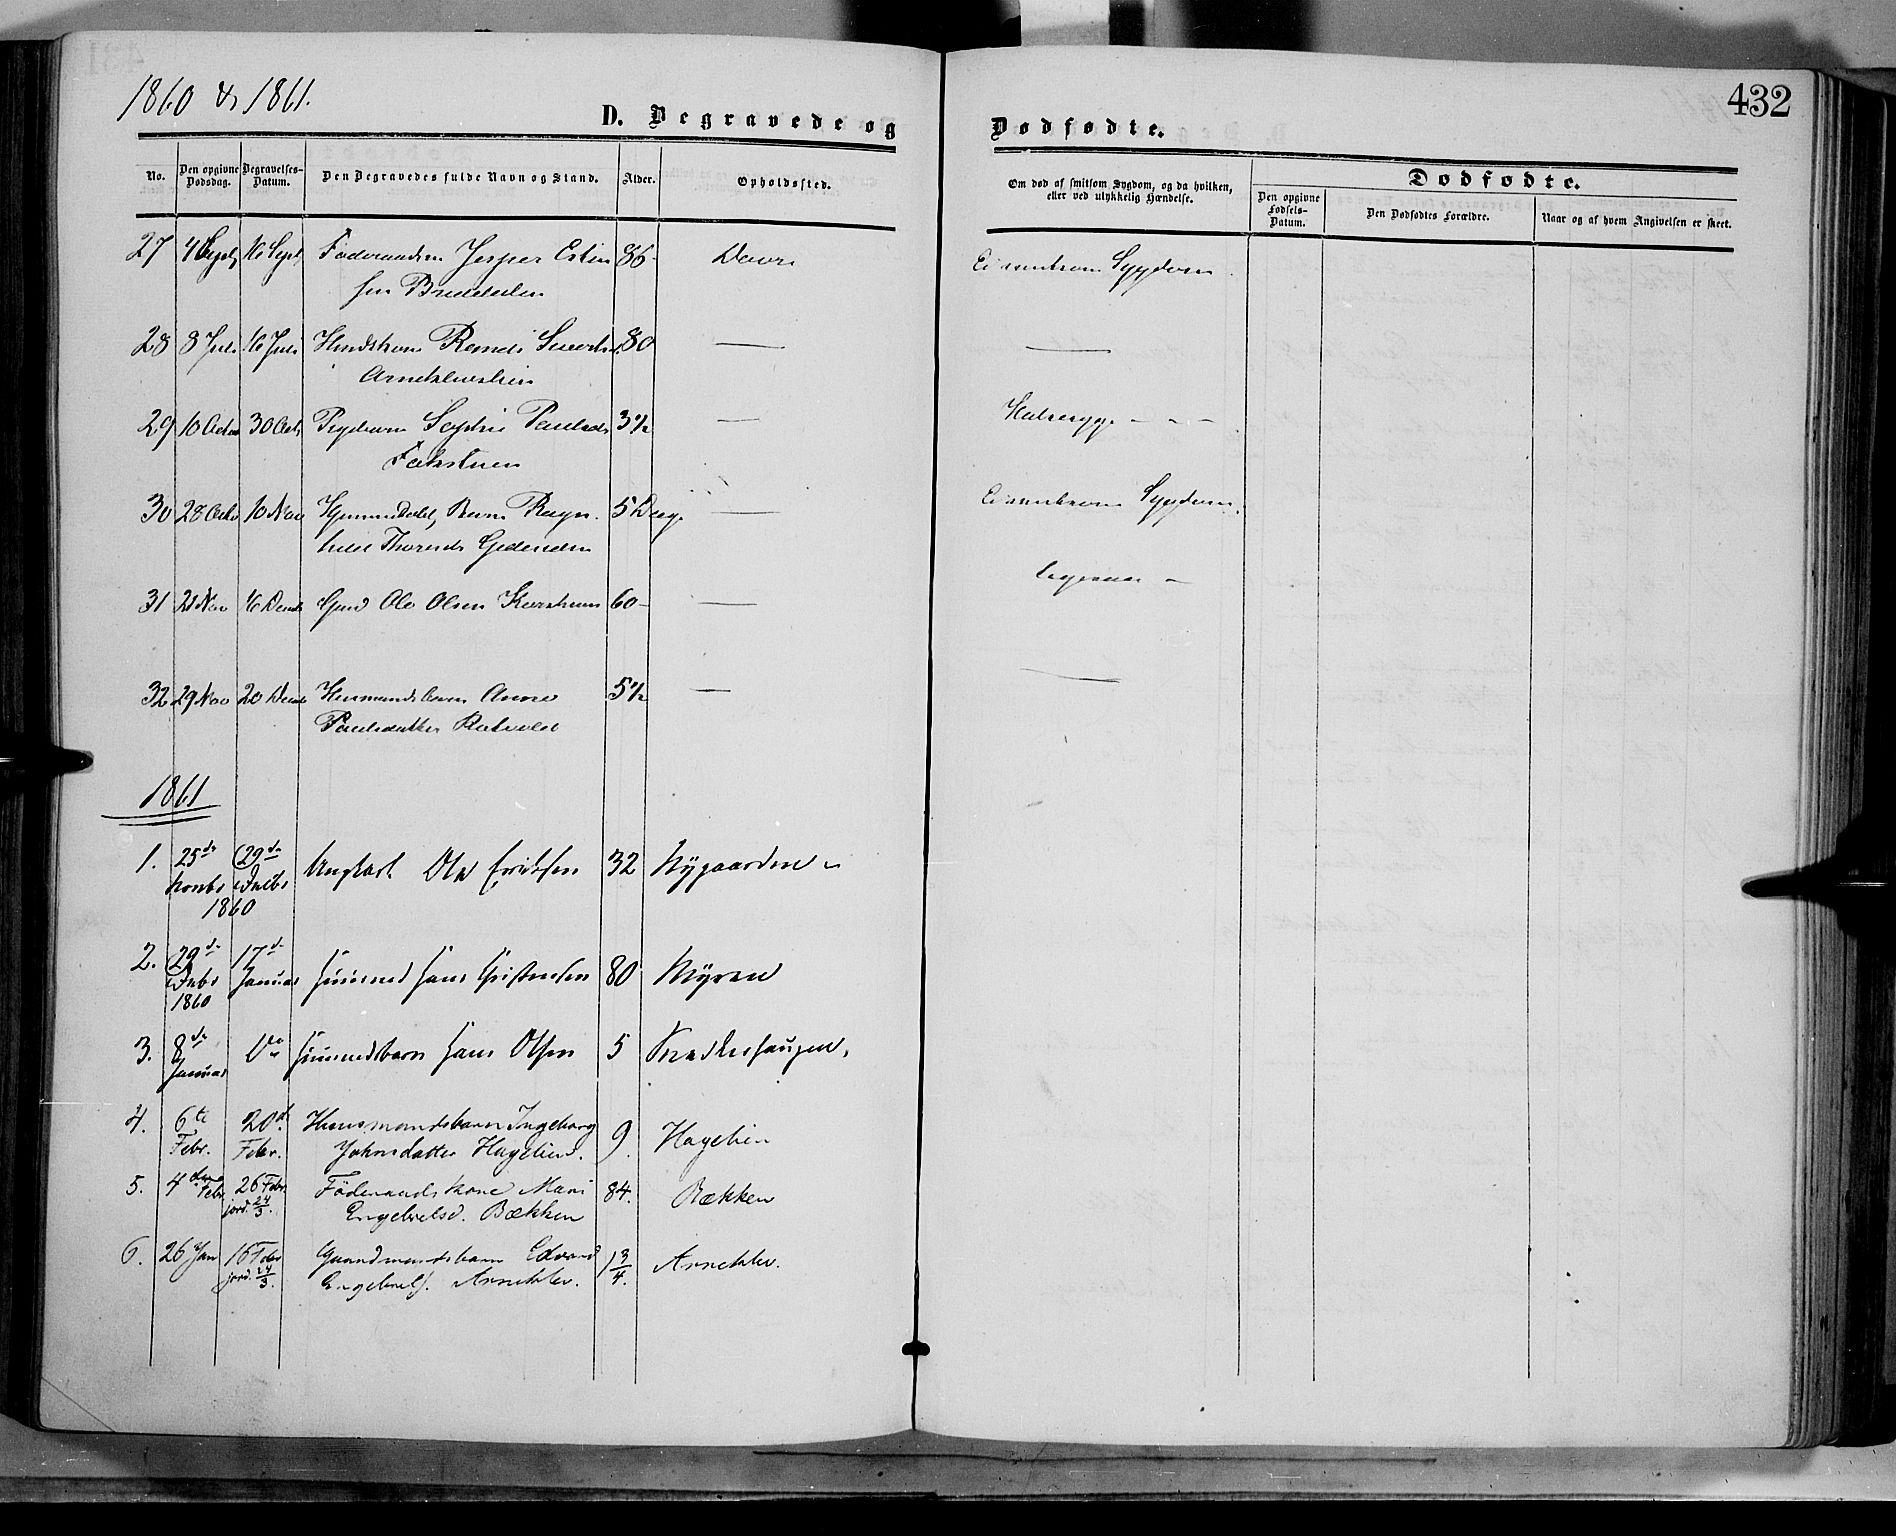 SAH, Dovre prestekontor, Ministerialbok nr. 1, 1854-1878, s. 432